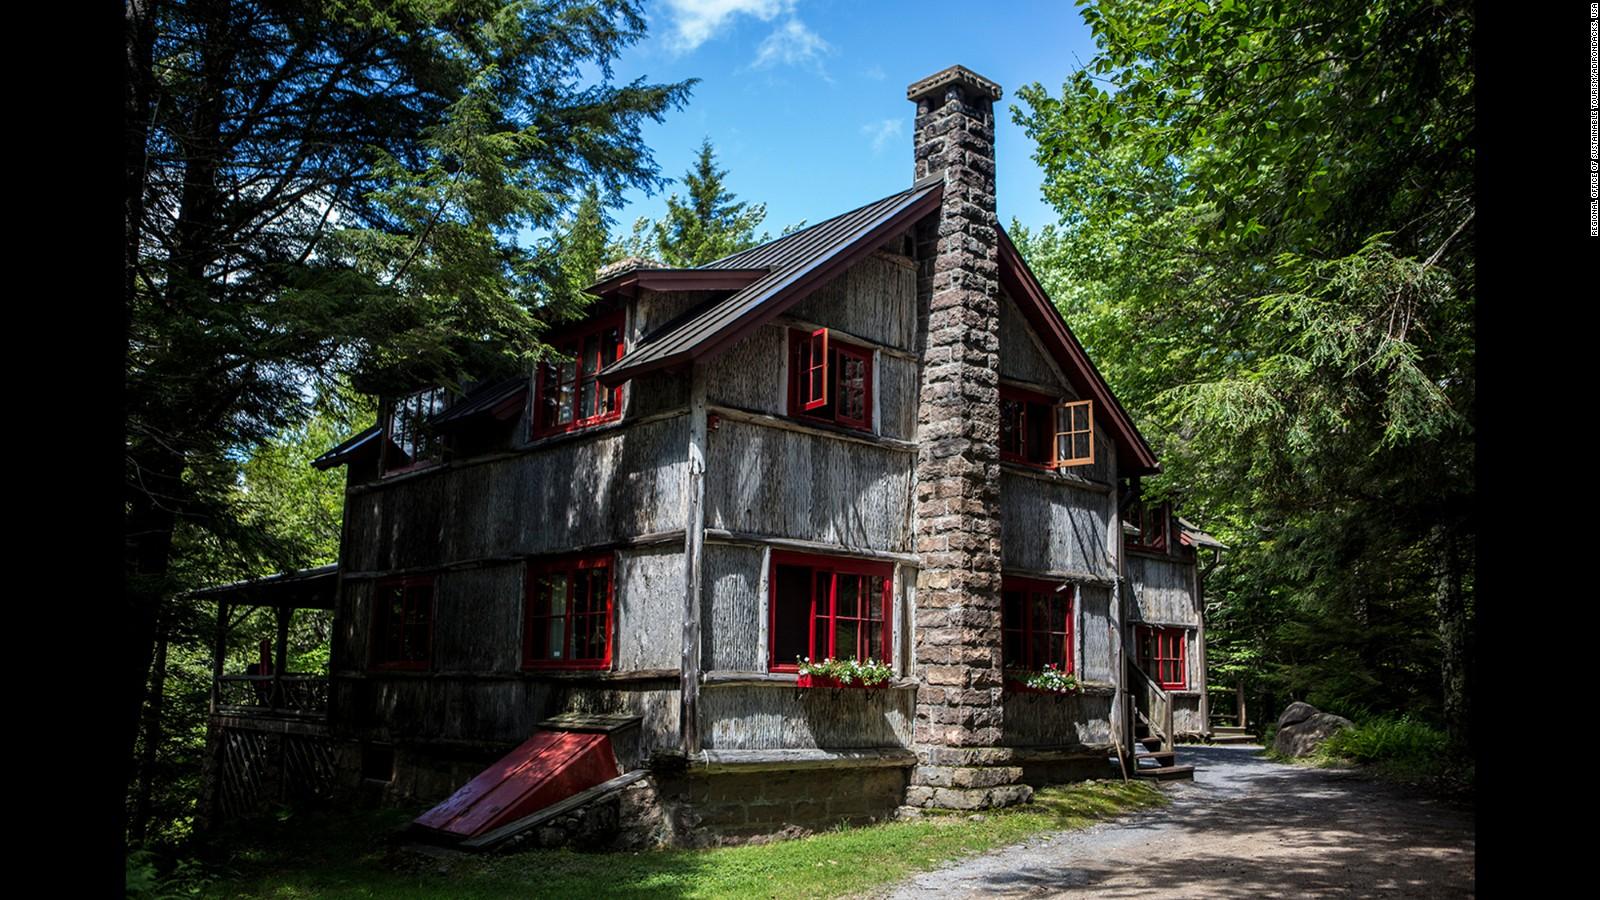 Adirondacks historic lodges: Rough it like millionaires